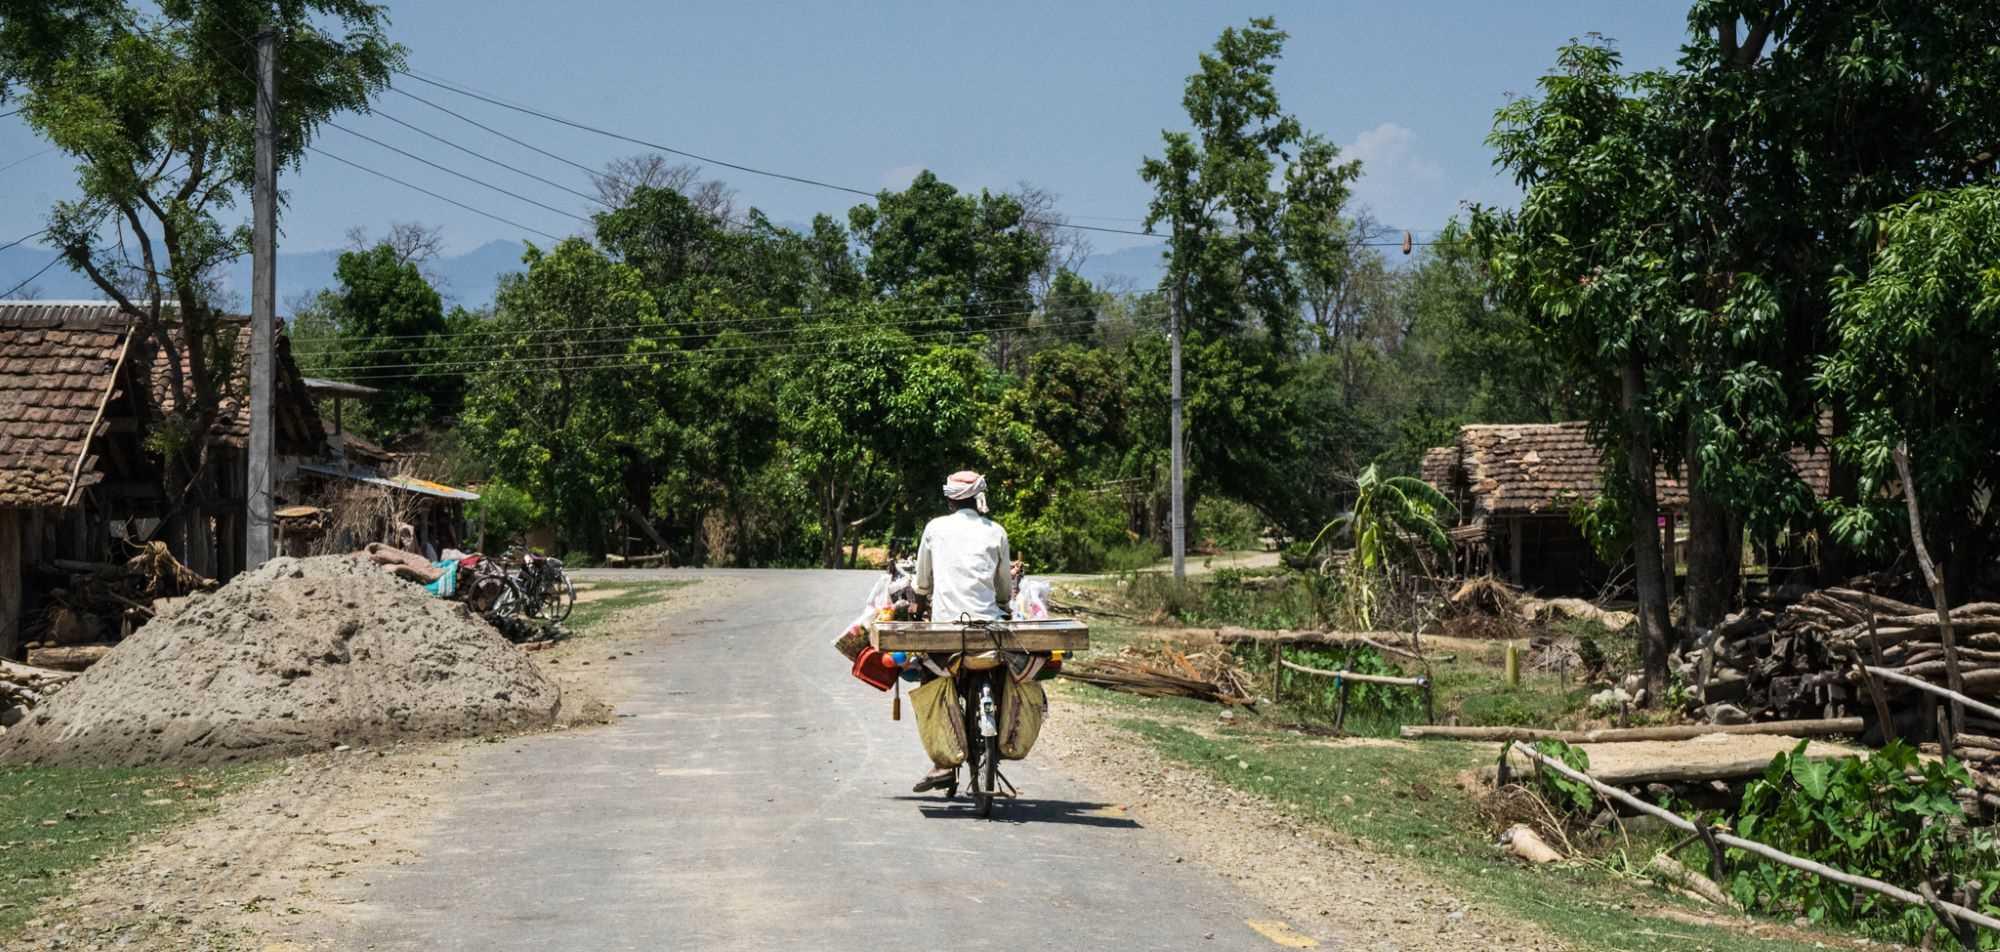 Tourisme responsable au sein du Bardia Community Homestay